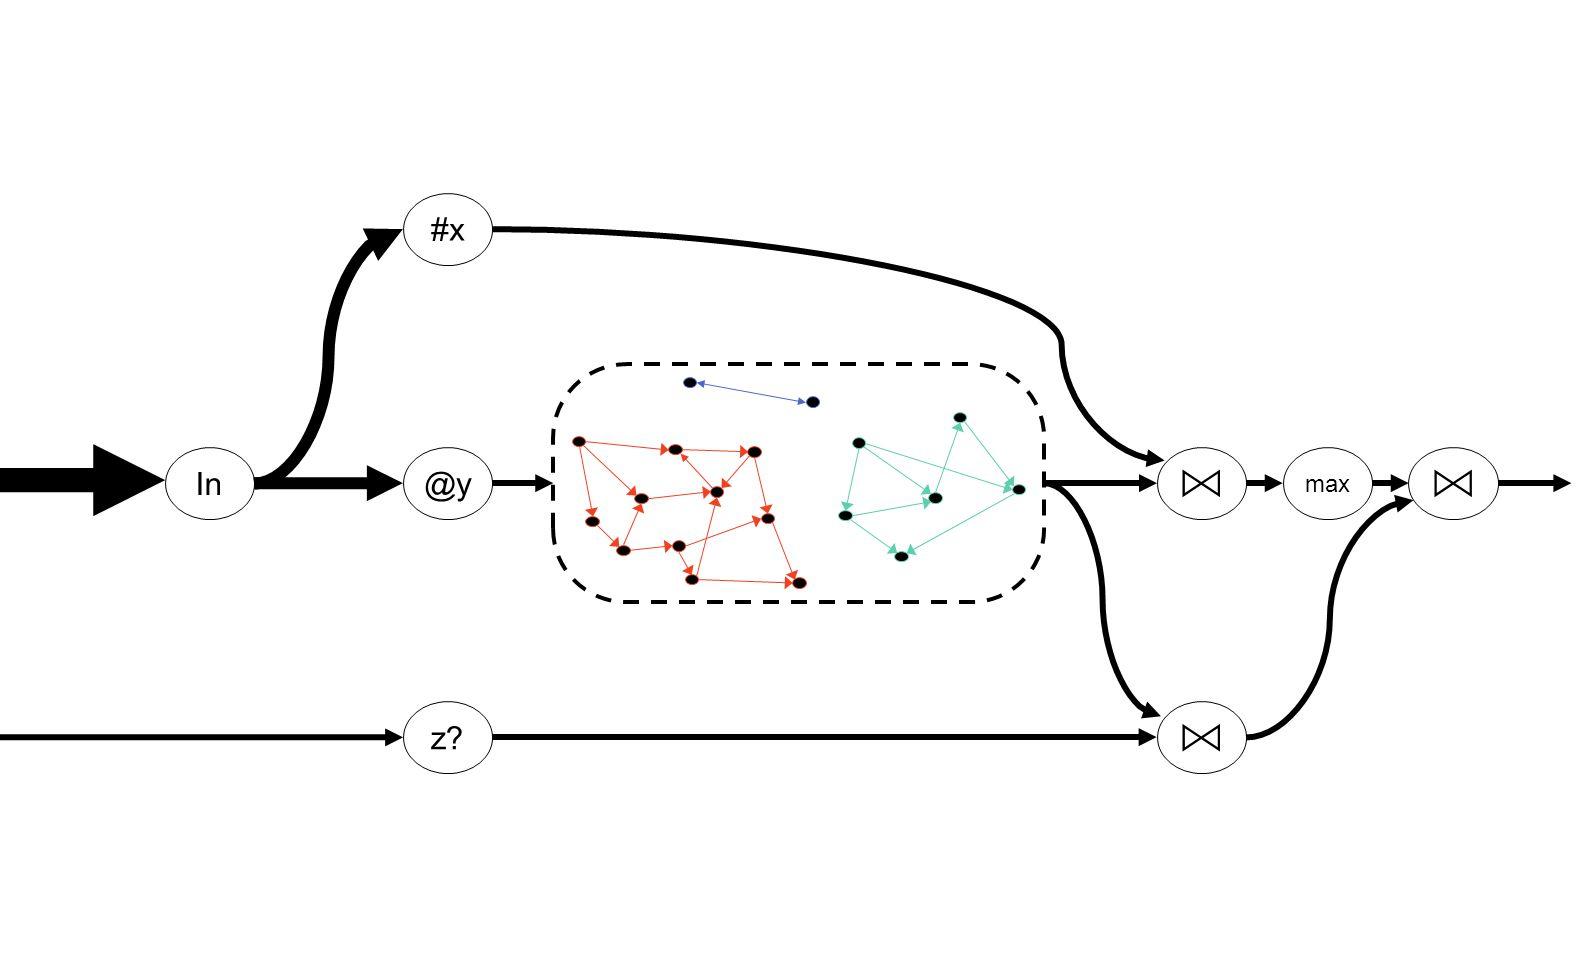 PageRank Pregel (Naiad) GraphLINQ GAS (Naiad) GAS (PowerGraph) Twitter graph 42 million nodes 1.5 billion edges 64  8-core 2.1 GHz AMD Opteron 16 GB RAM per server Gigabit Ethernet